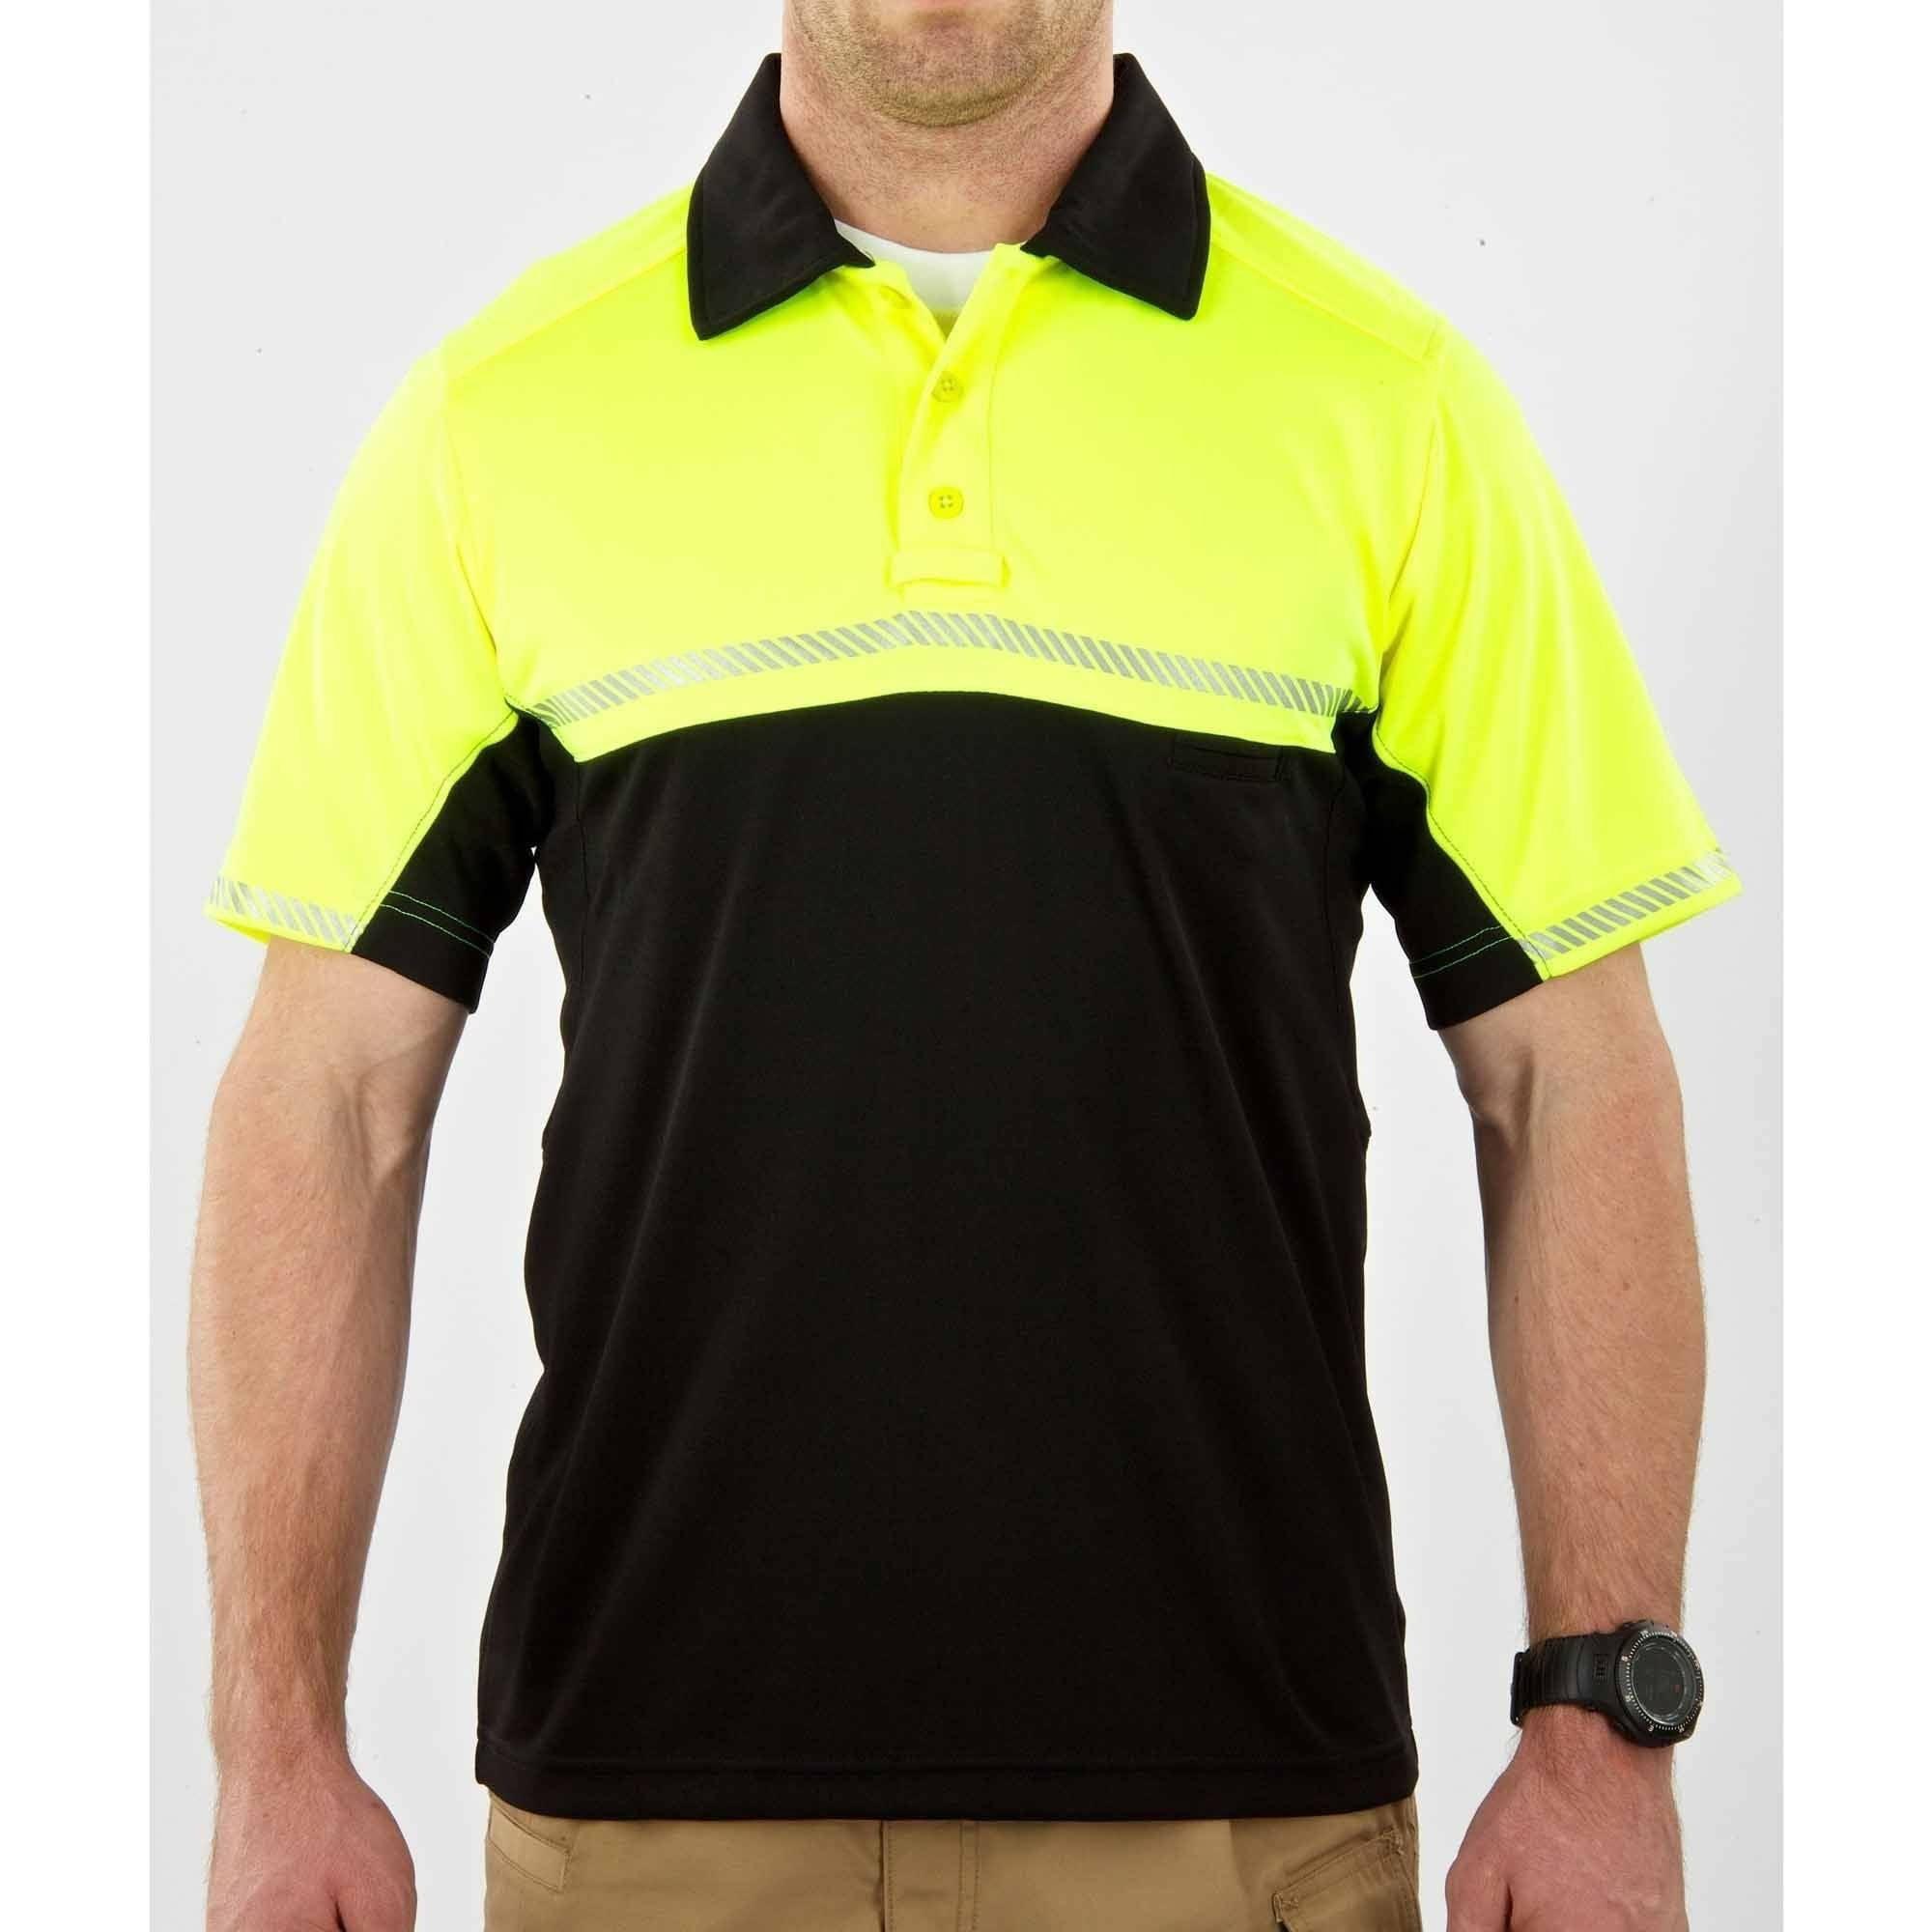 5.11 Tactical Bike Patrol Short Sleeve Polo, High-Vis Yellow